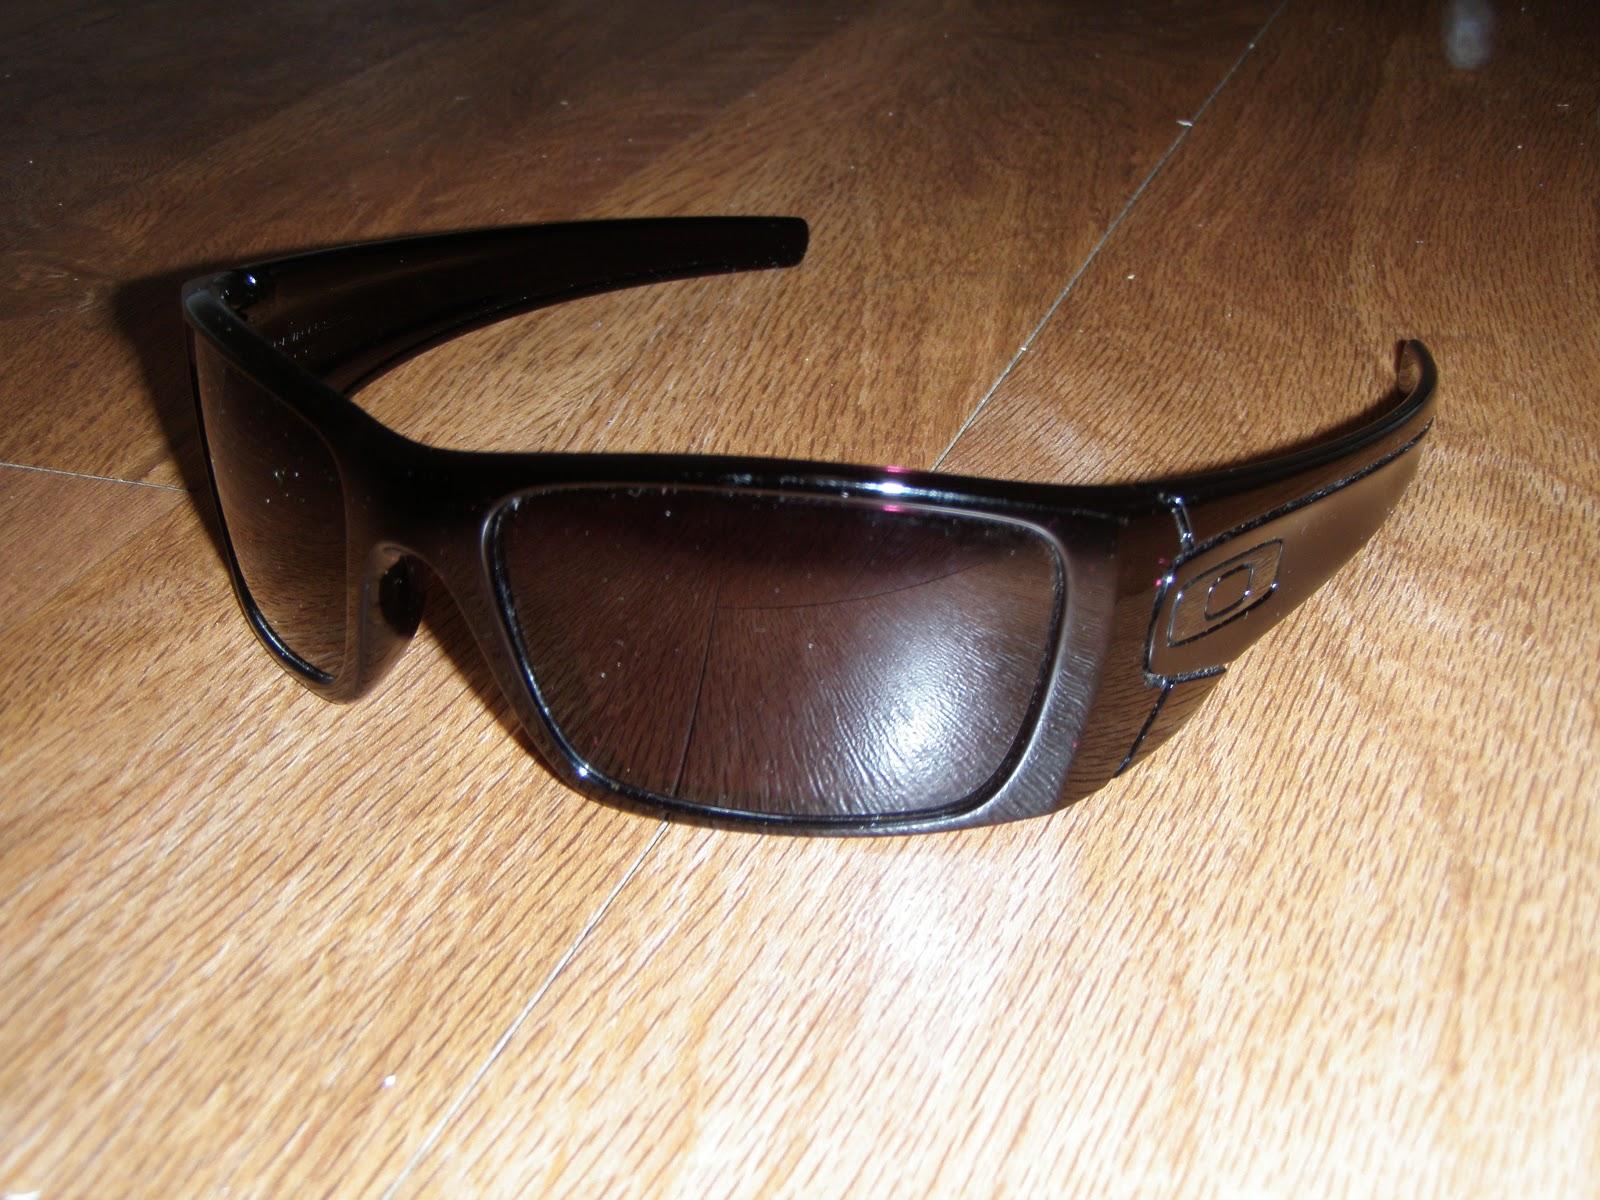 repairing oakley sunglasses